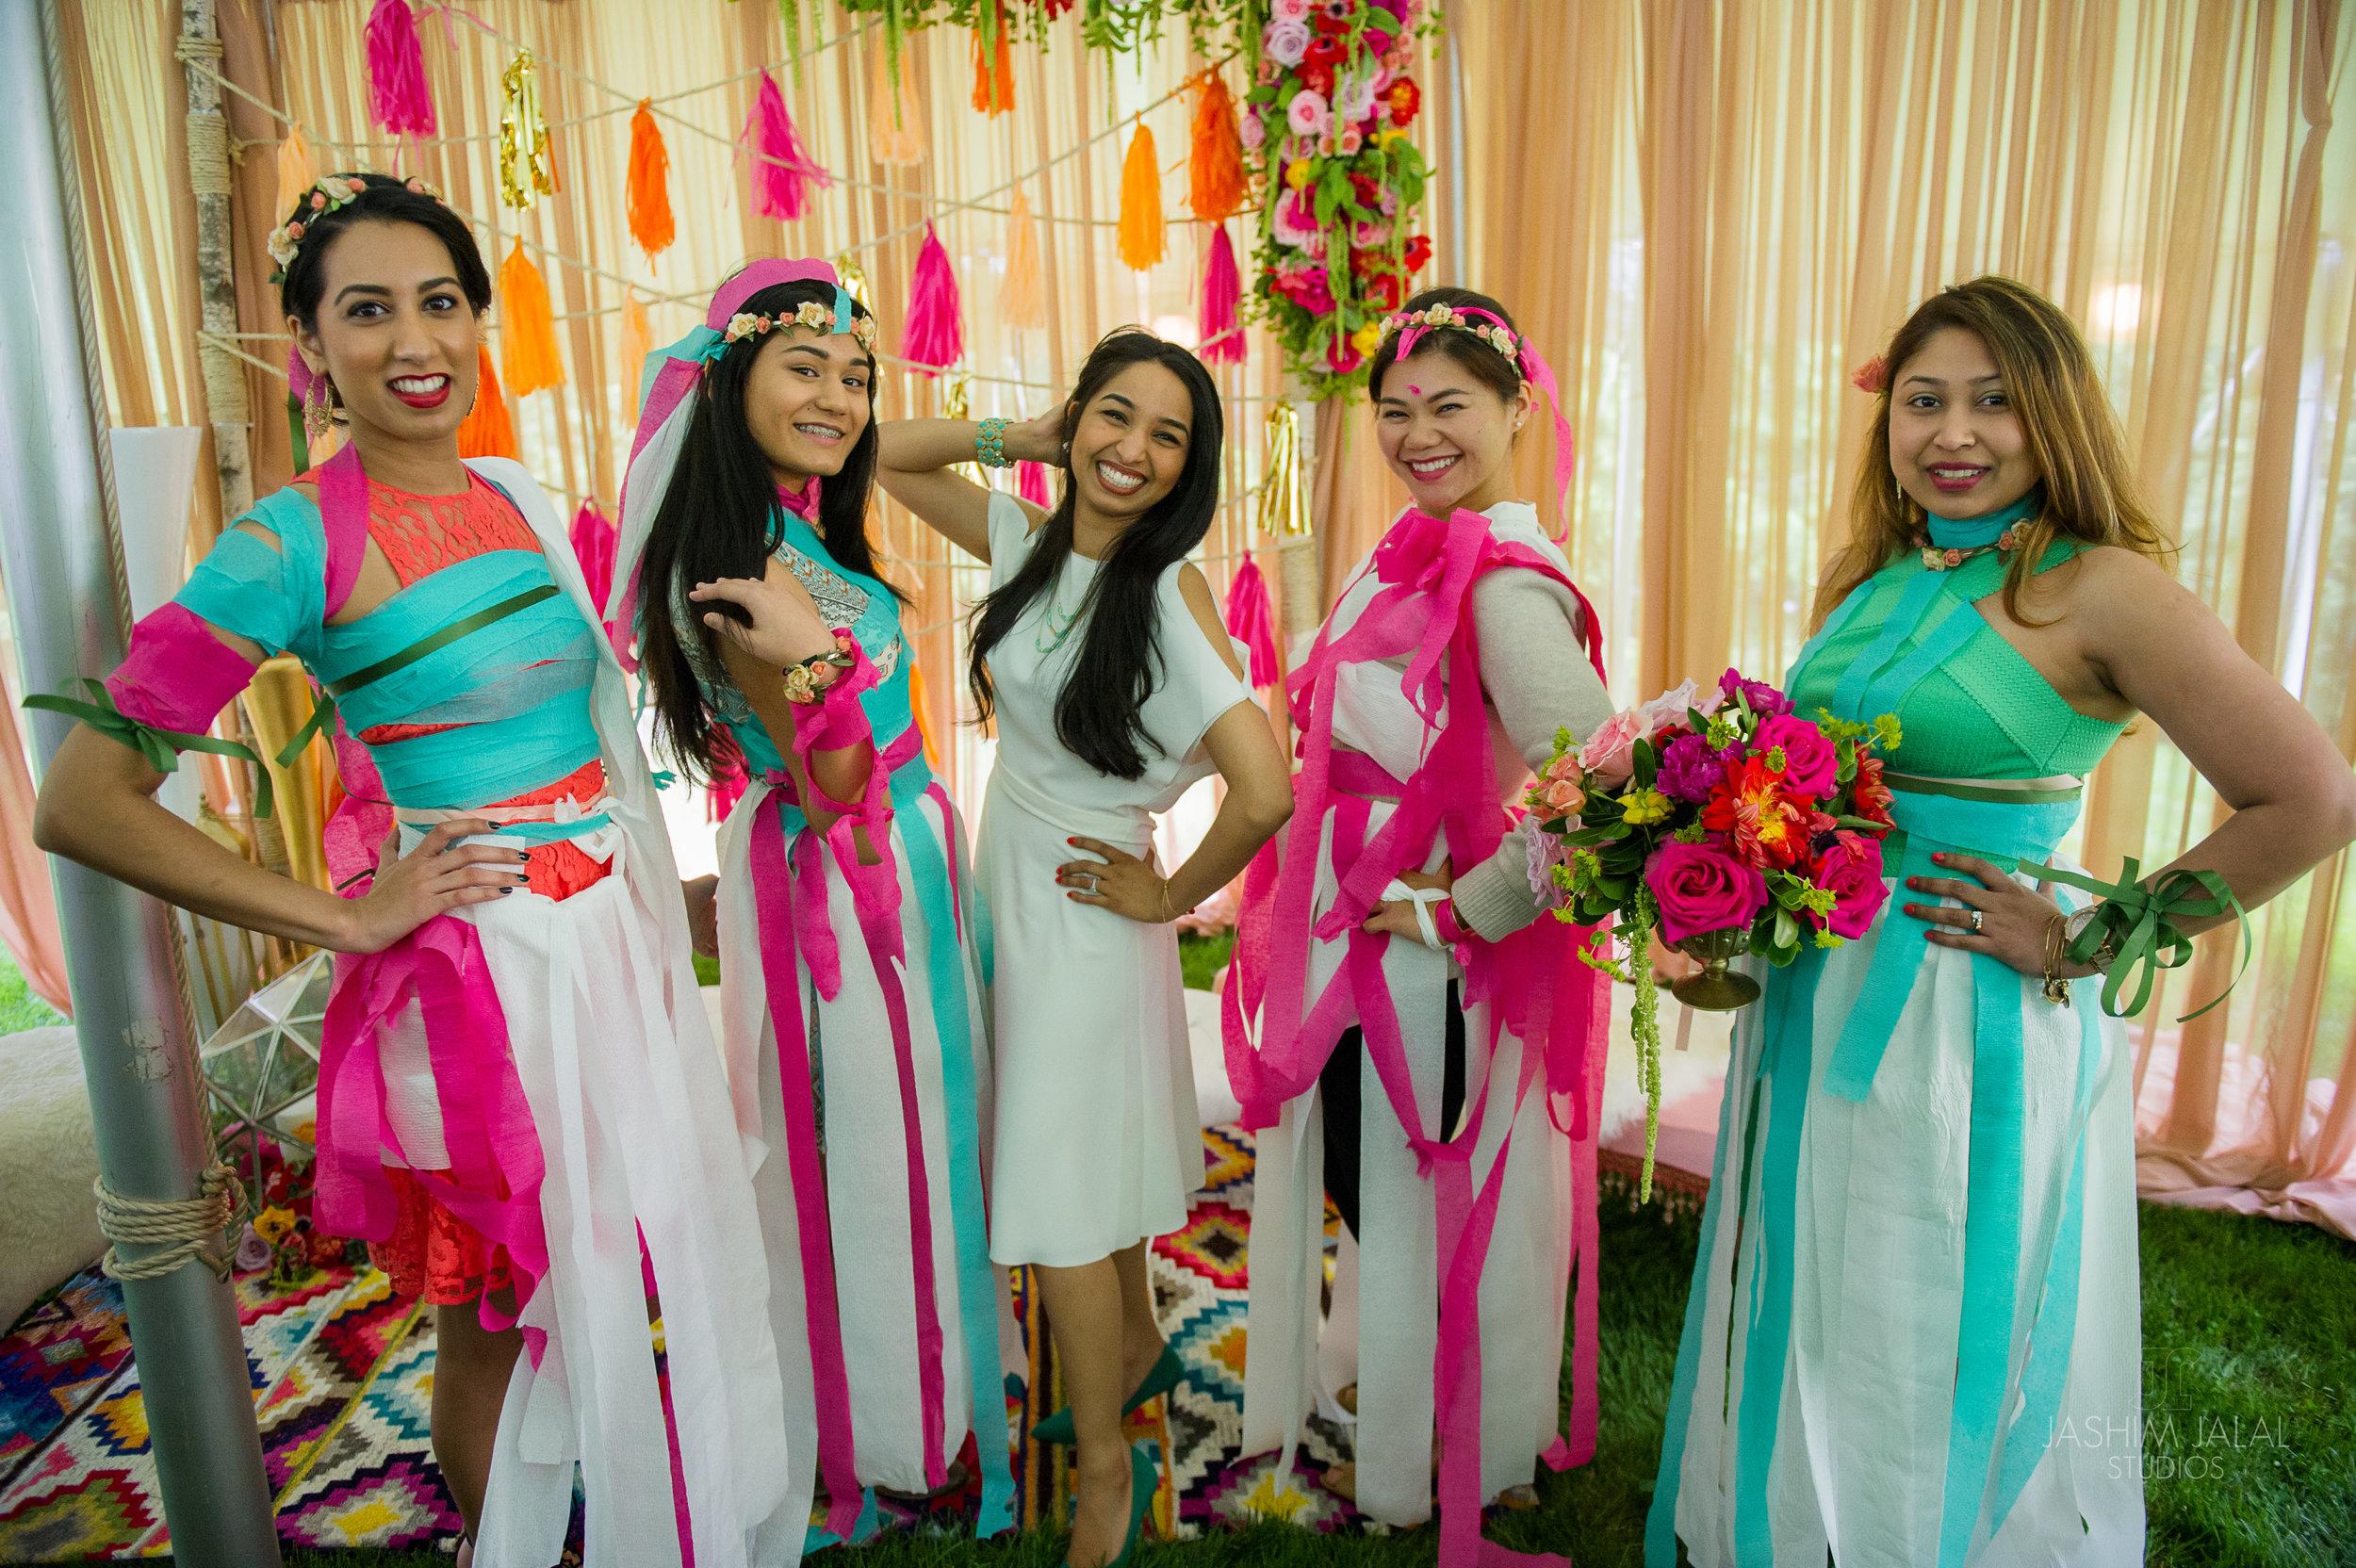 Indian Bridal Shower Boho Chic Summer Tent Event with Dancer (9).JPG